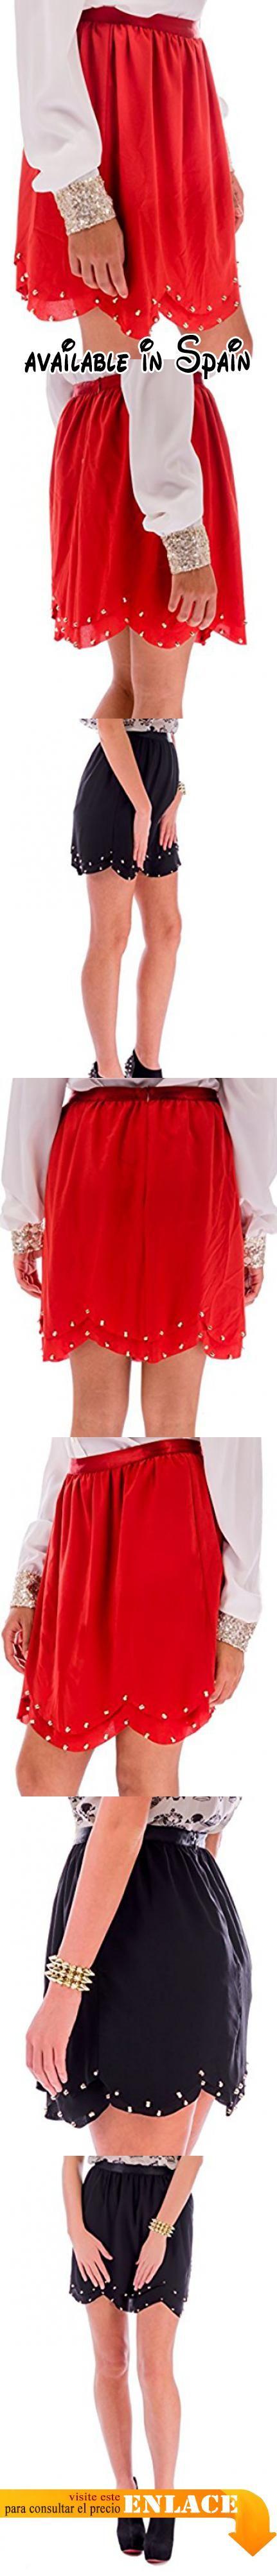 B06Y17RX8N : Ça Va Bien Fashion - Falda - para mujer naranja Tango 36.